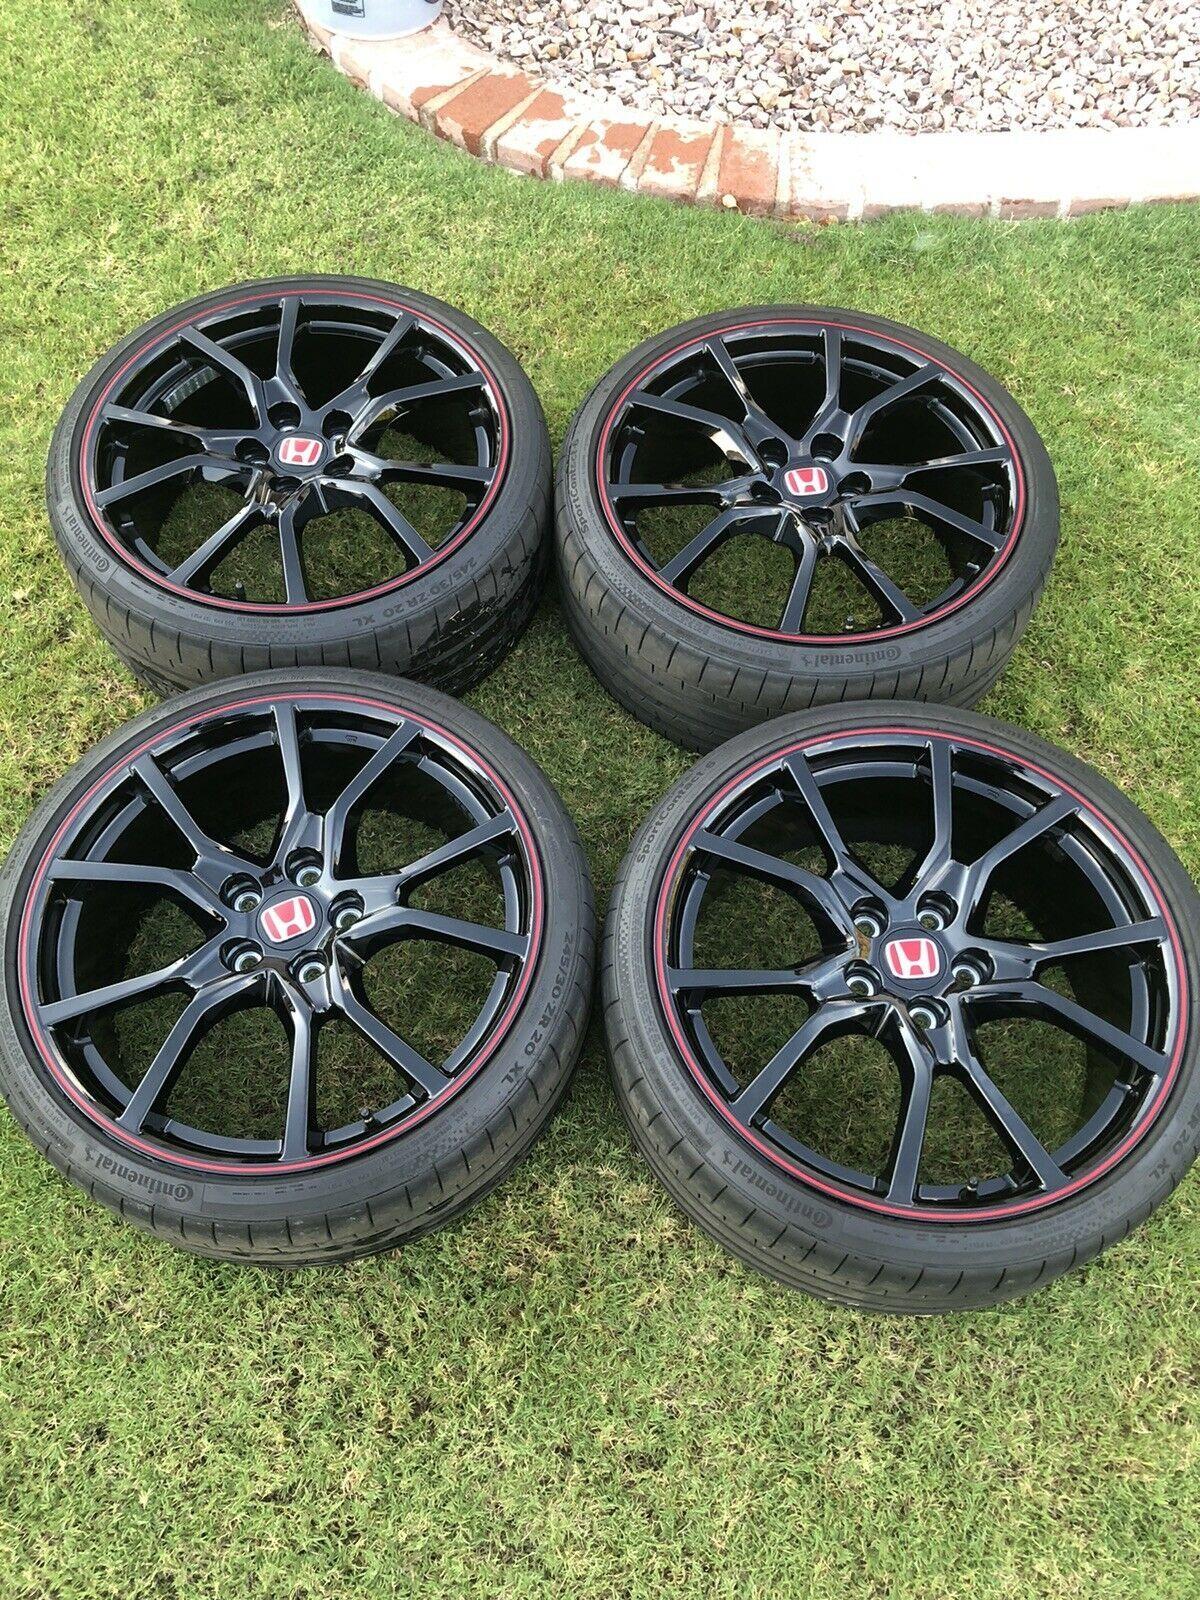 19 Rims And Tires Rims And Tires Honda Civic Accessories Honda Rims